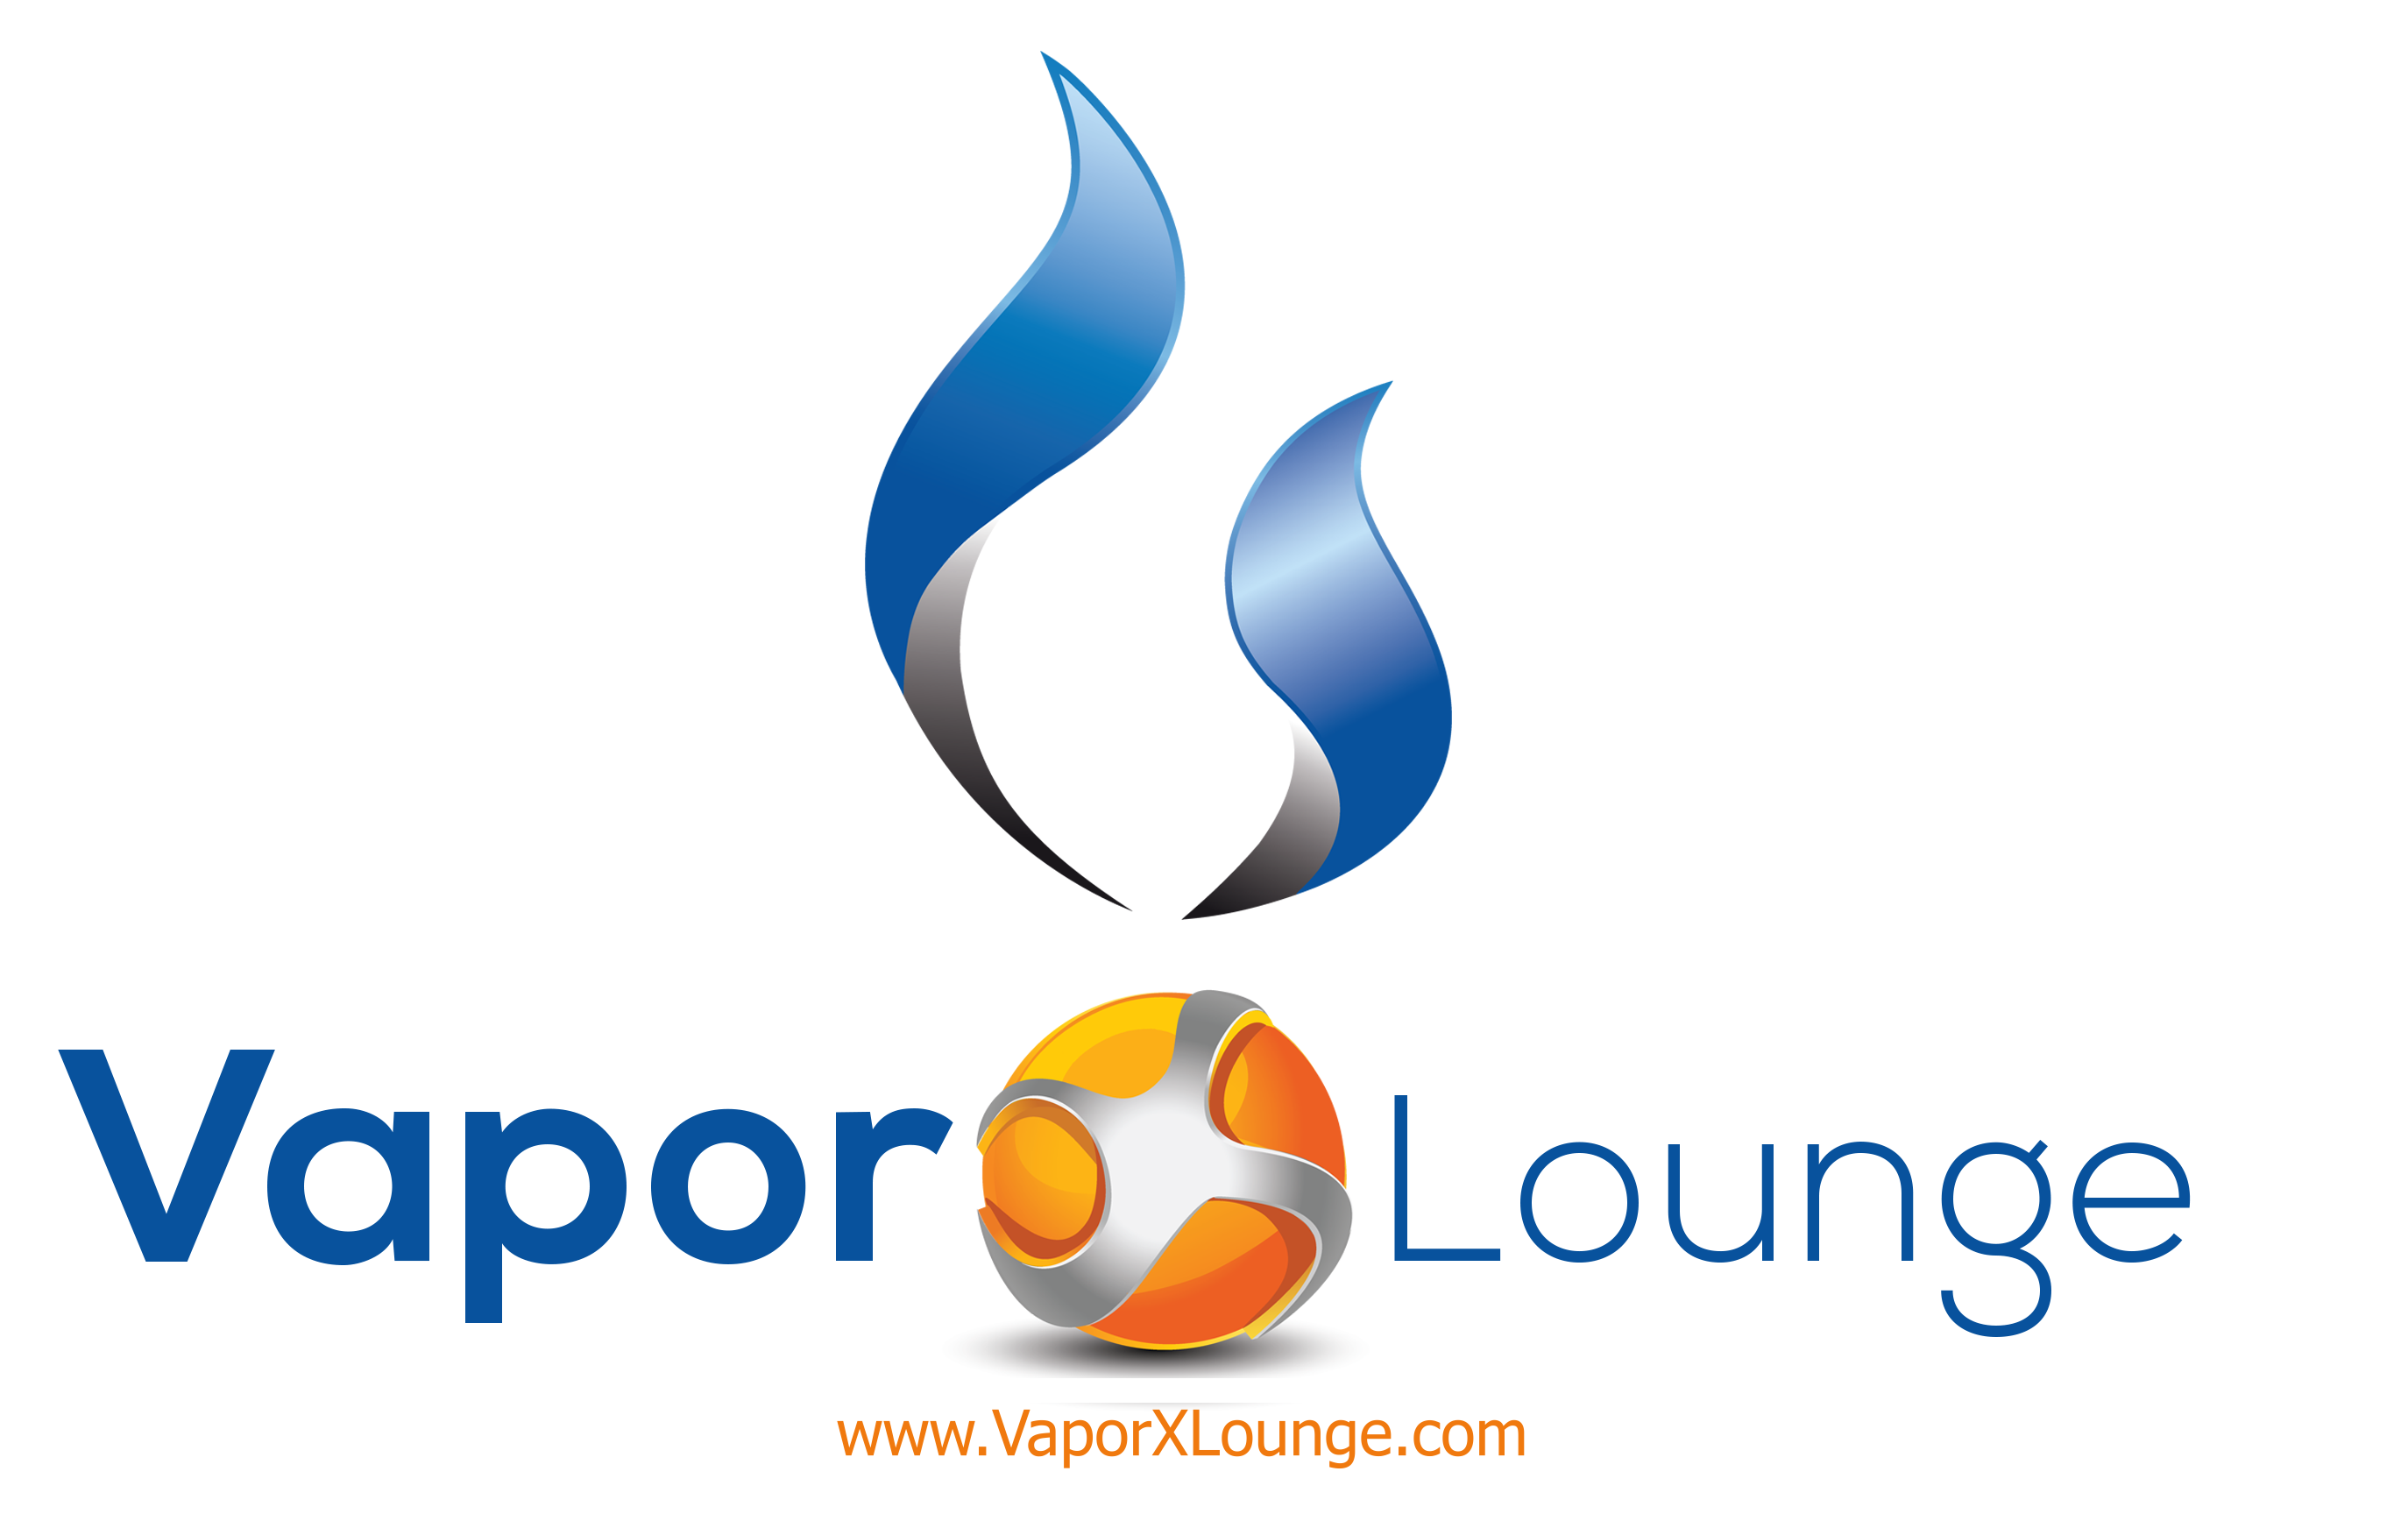 Vapor X Lounge